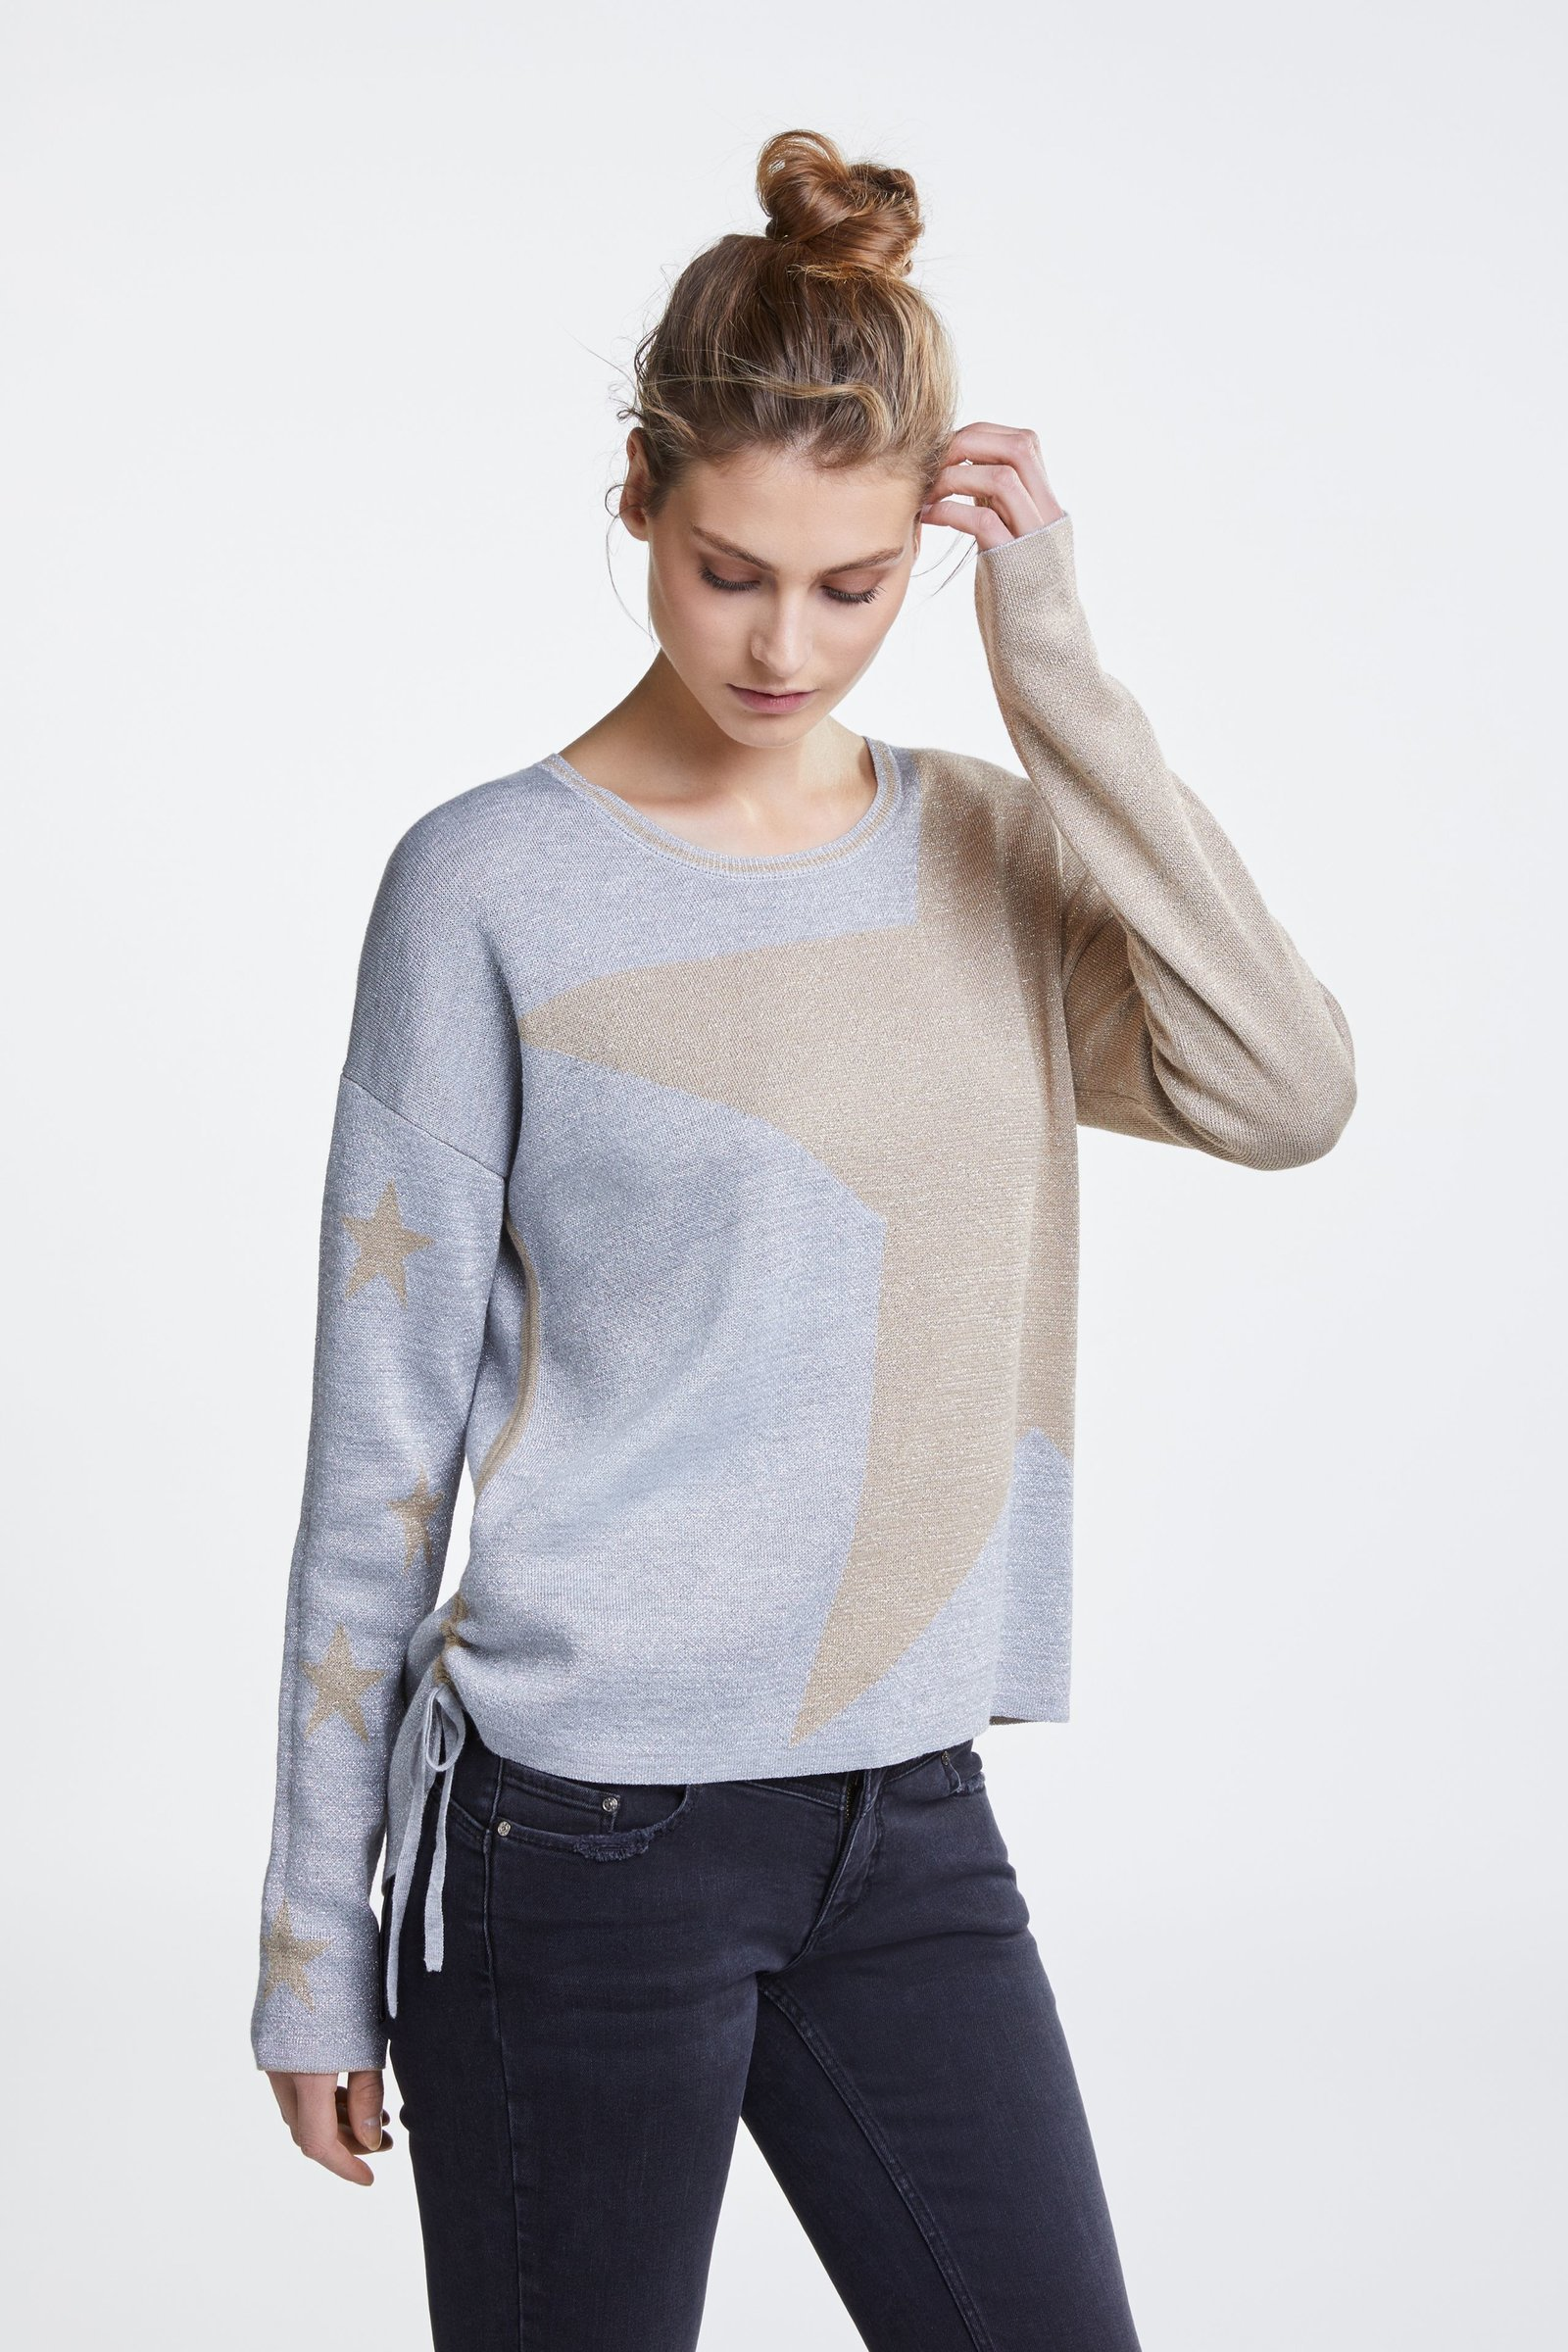 Fine Knit Sweater with Glittery Stars OUISWEATGREY